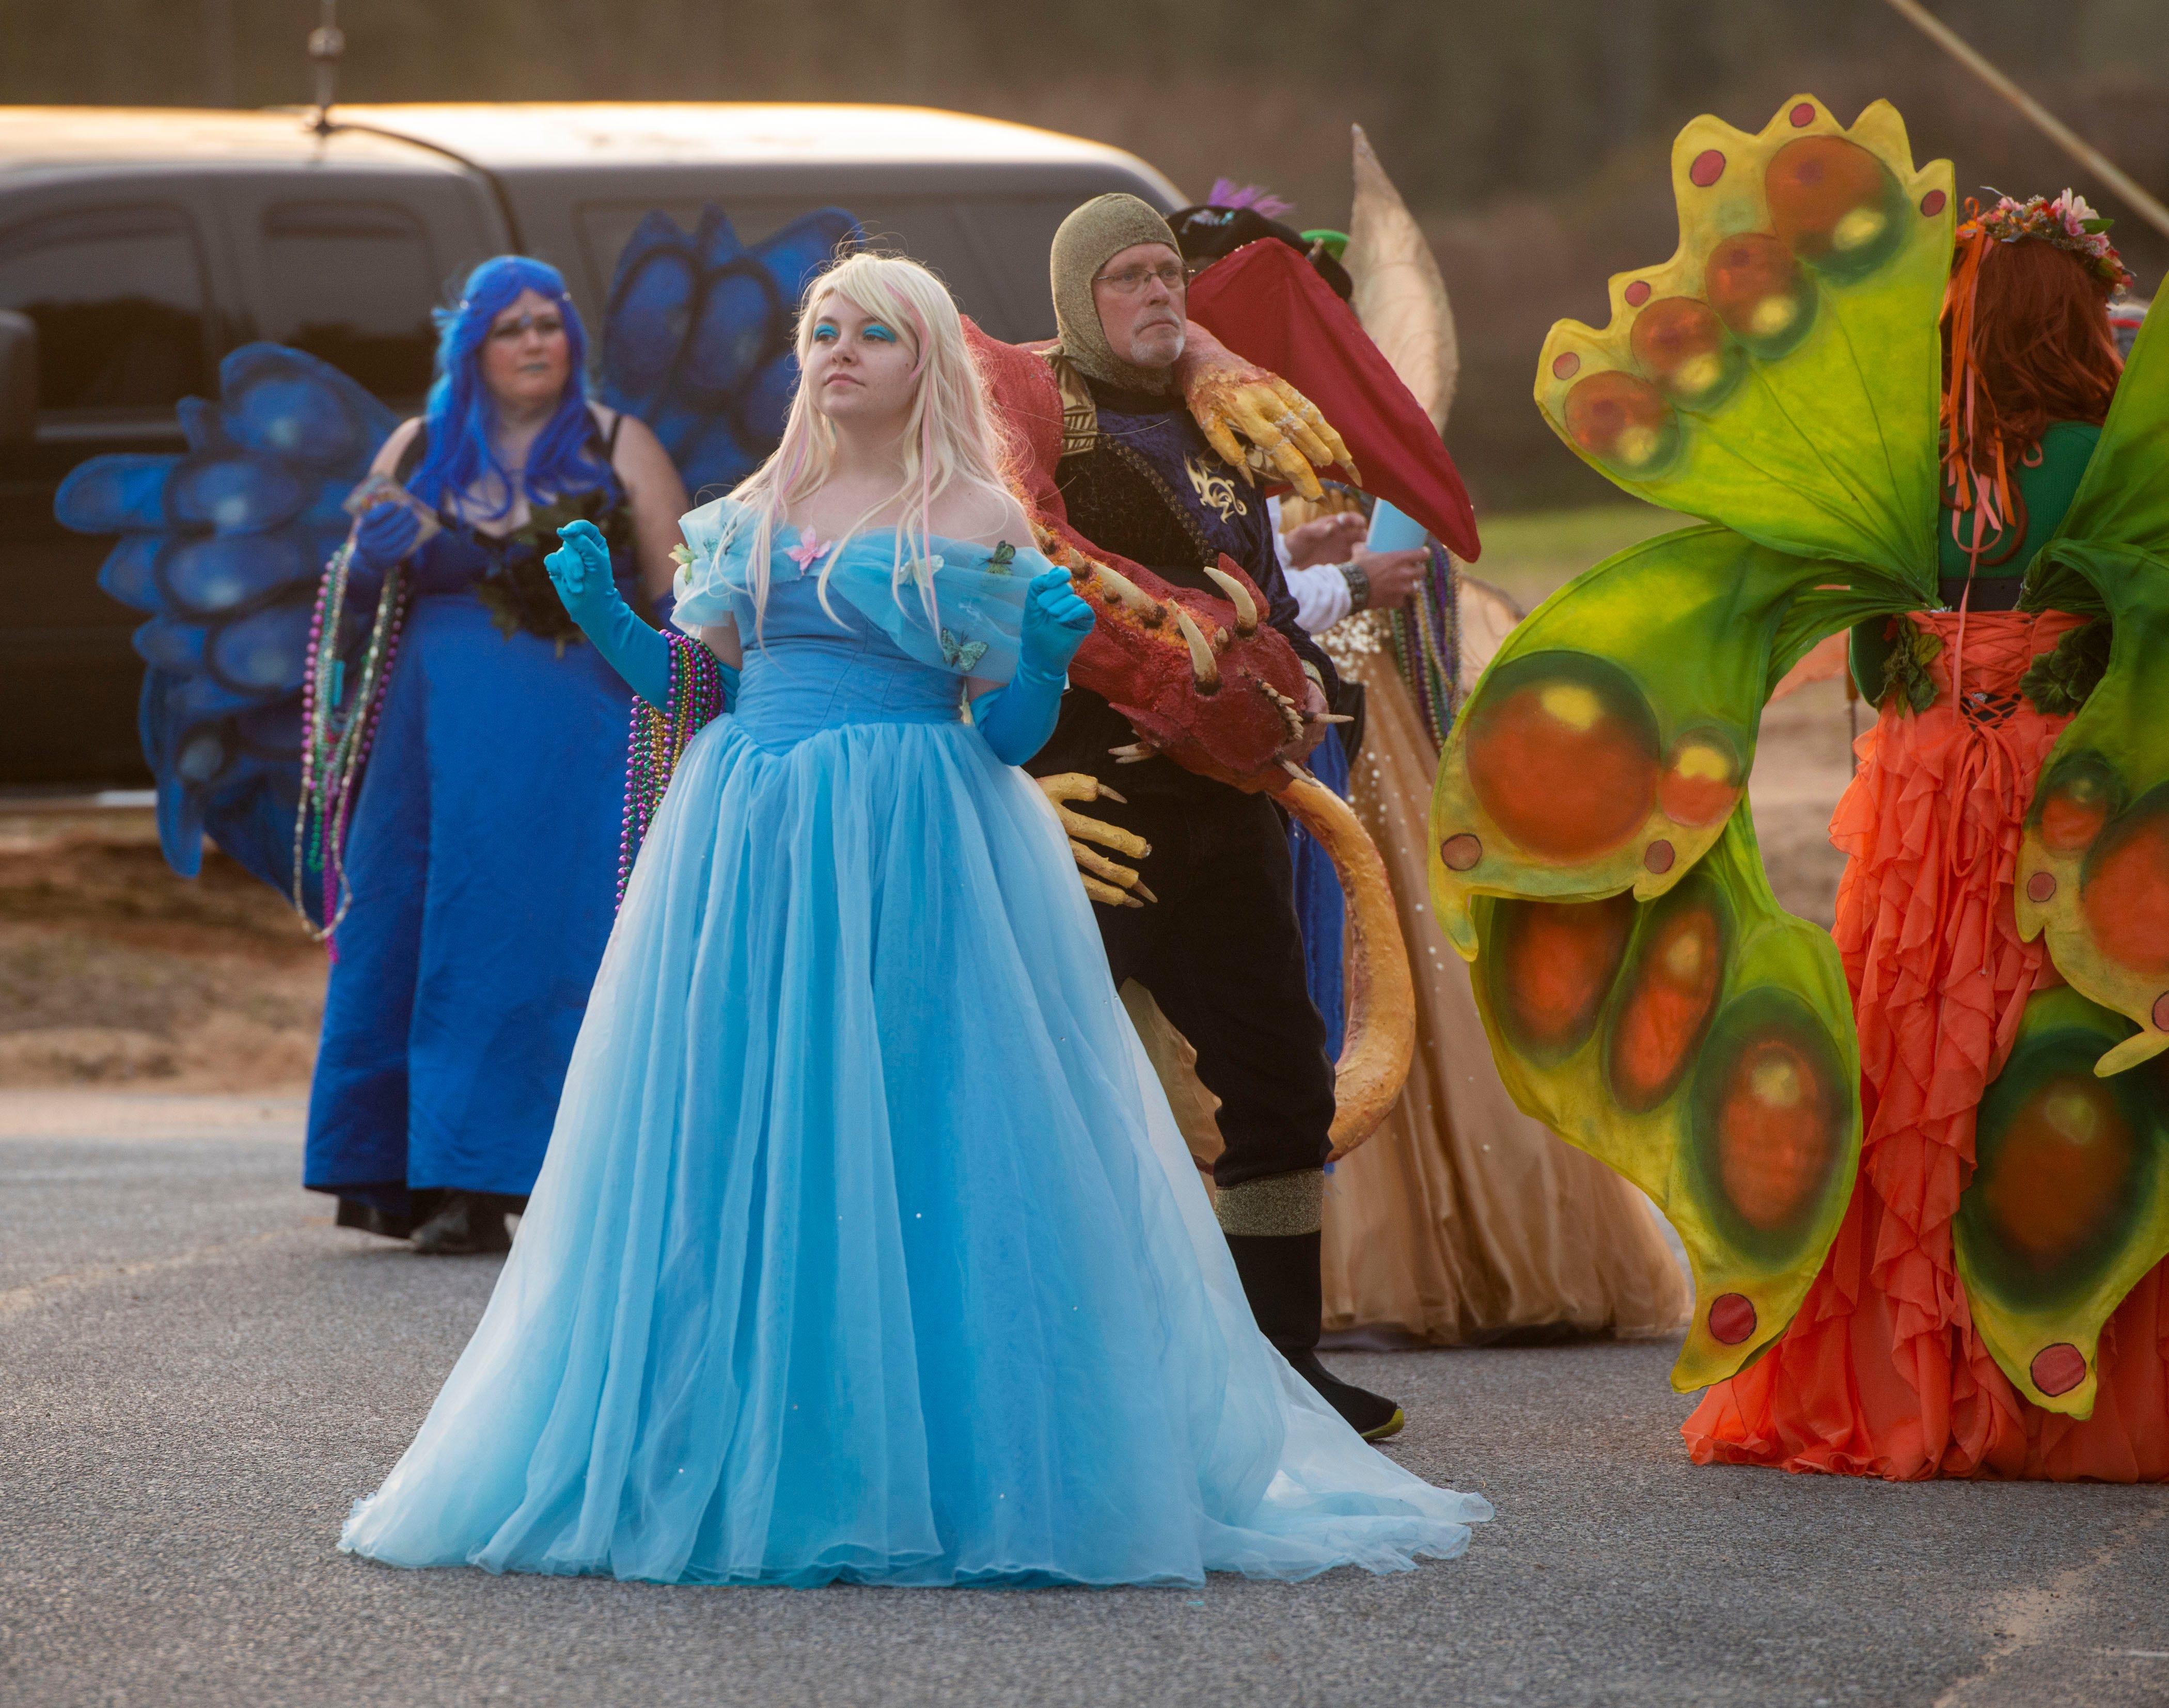 Mardi Gras Season Heats Up With A Flotilla Parades And Balls Galore